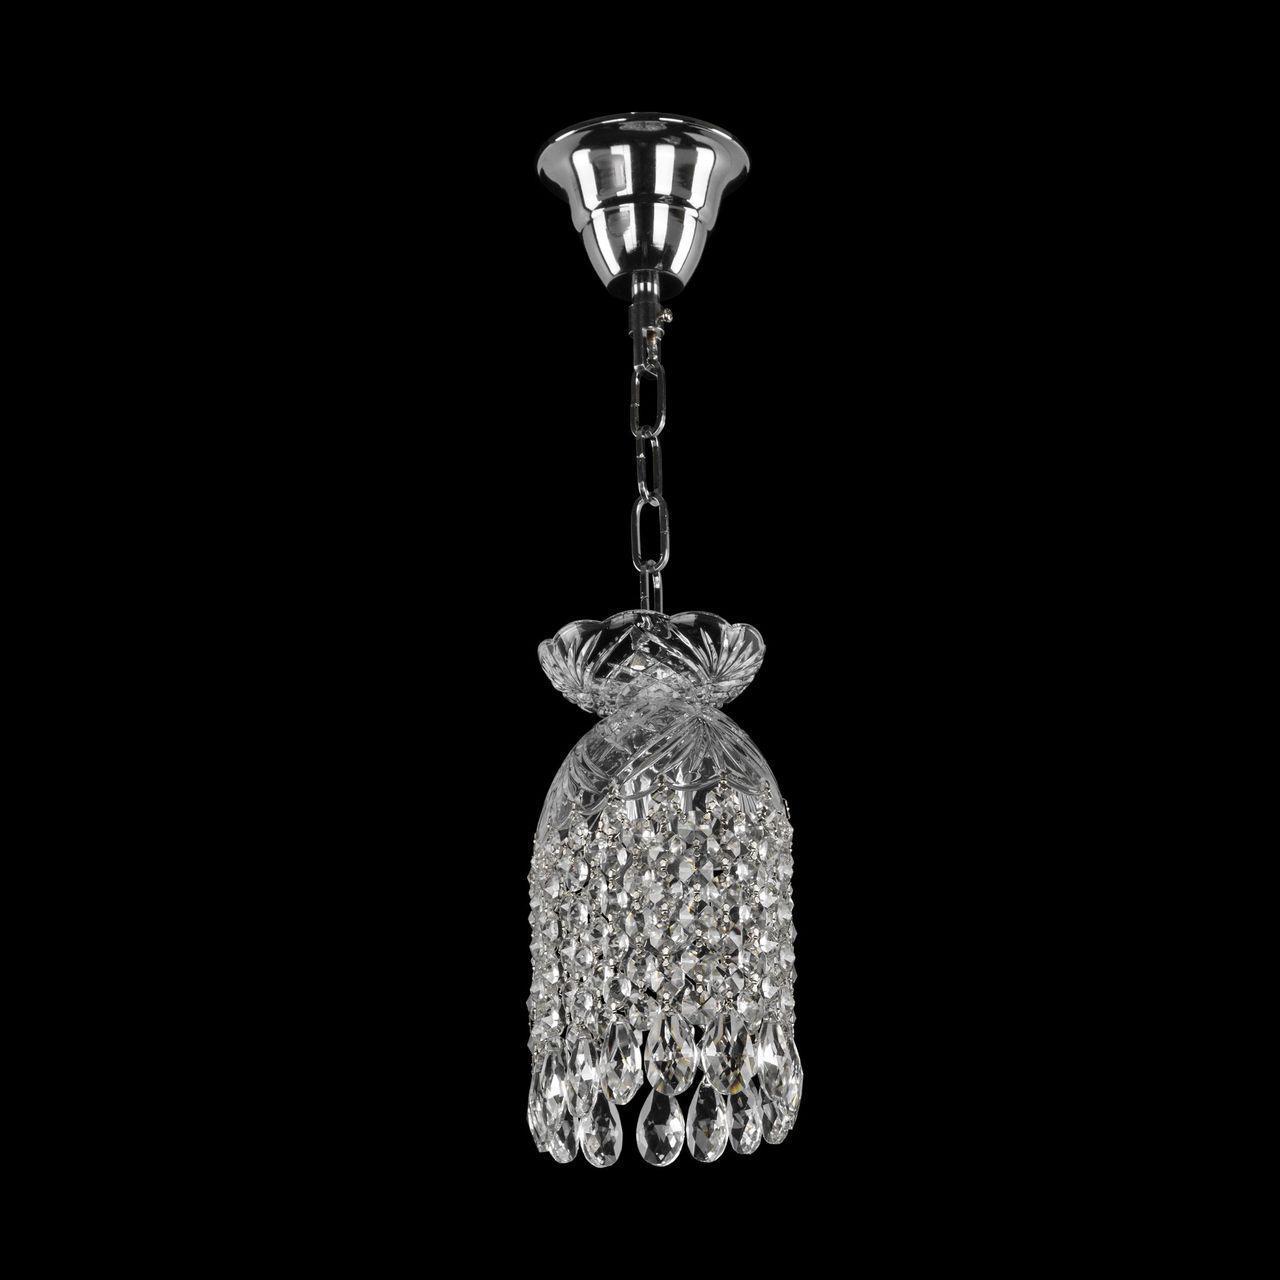 Подвесной светильник Bohemia Ivele 14783/16 Ni